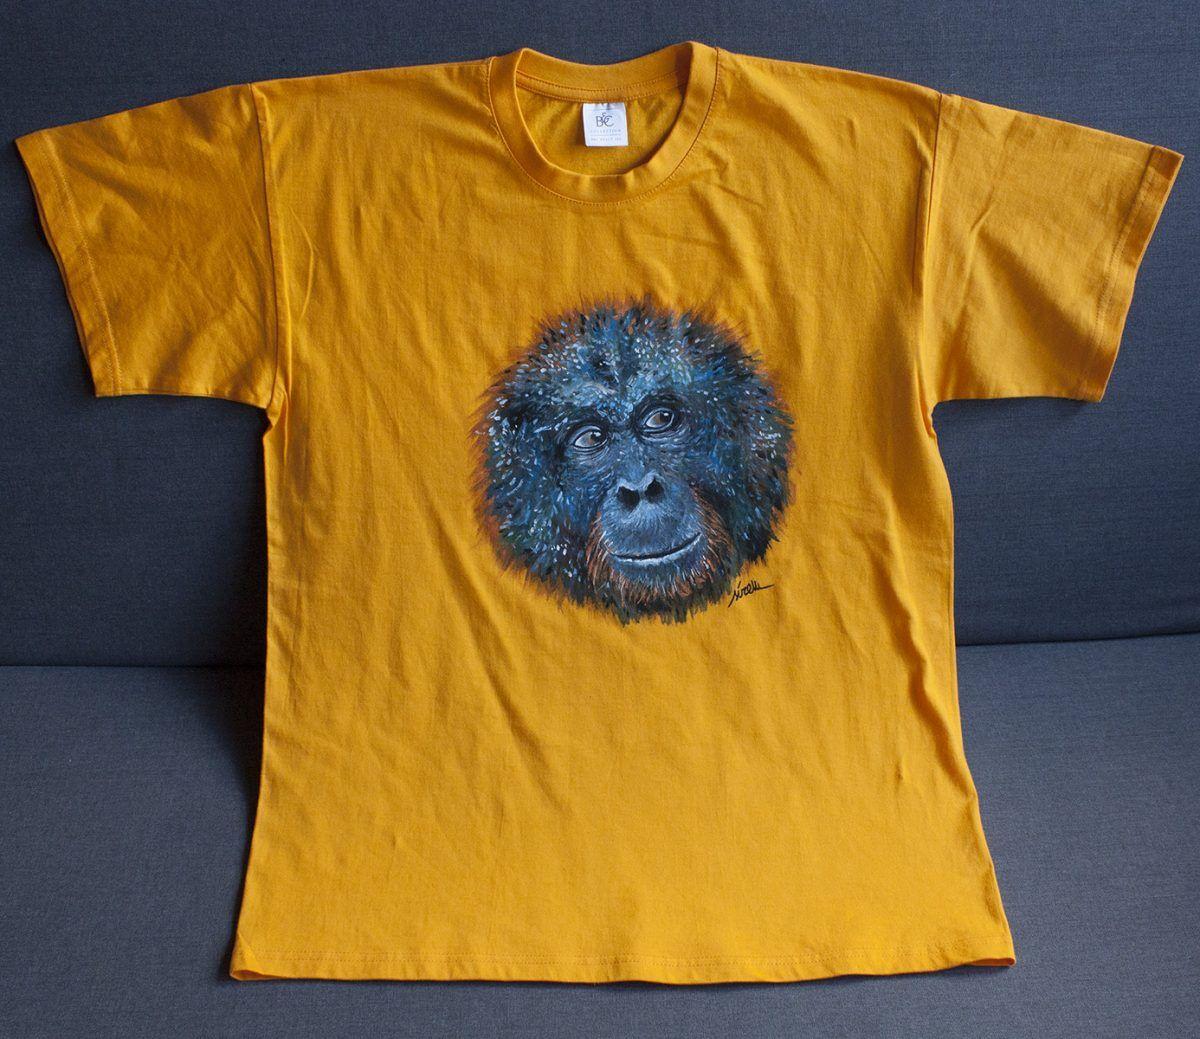 camiseta pintada a mano-orangutan-hombre unisex-sirem wild